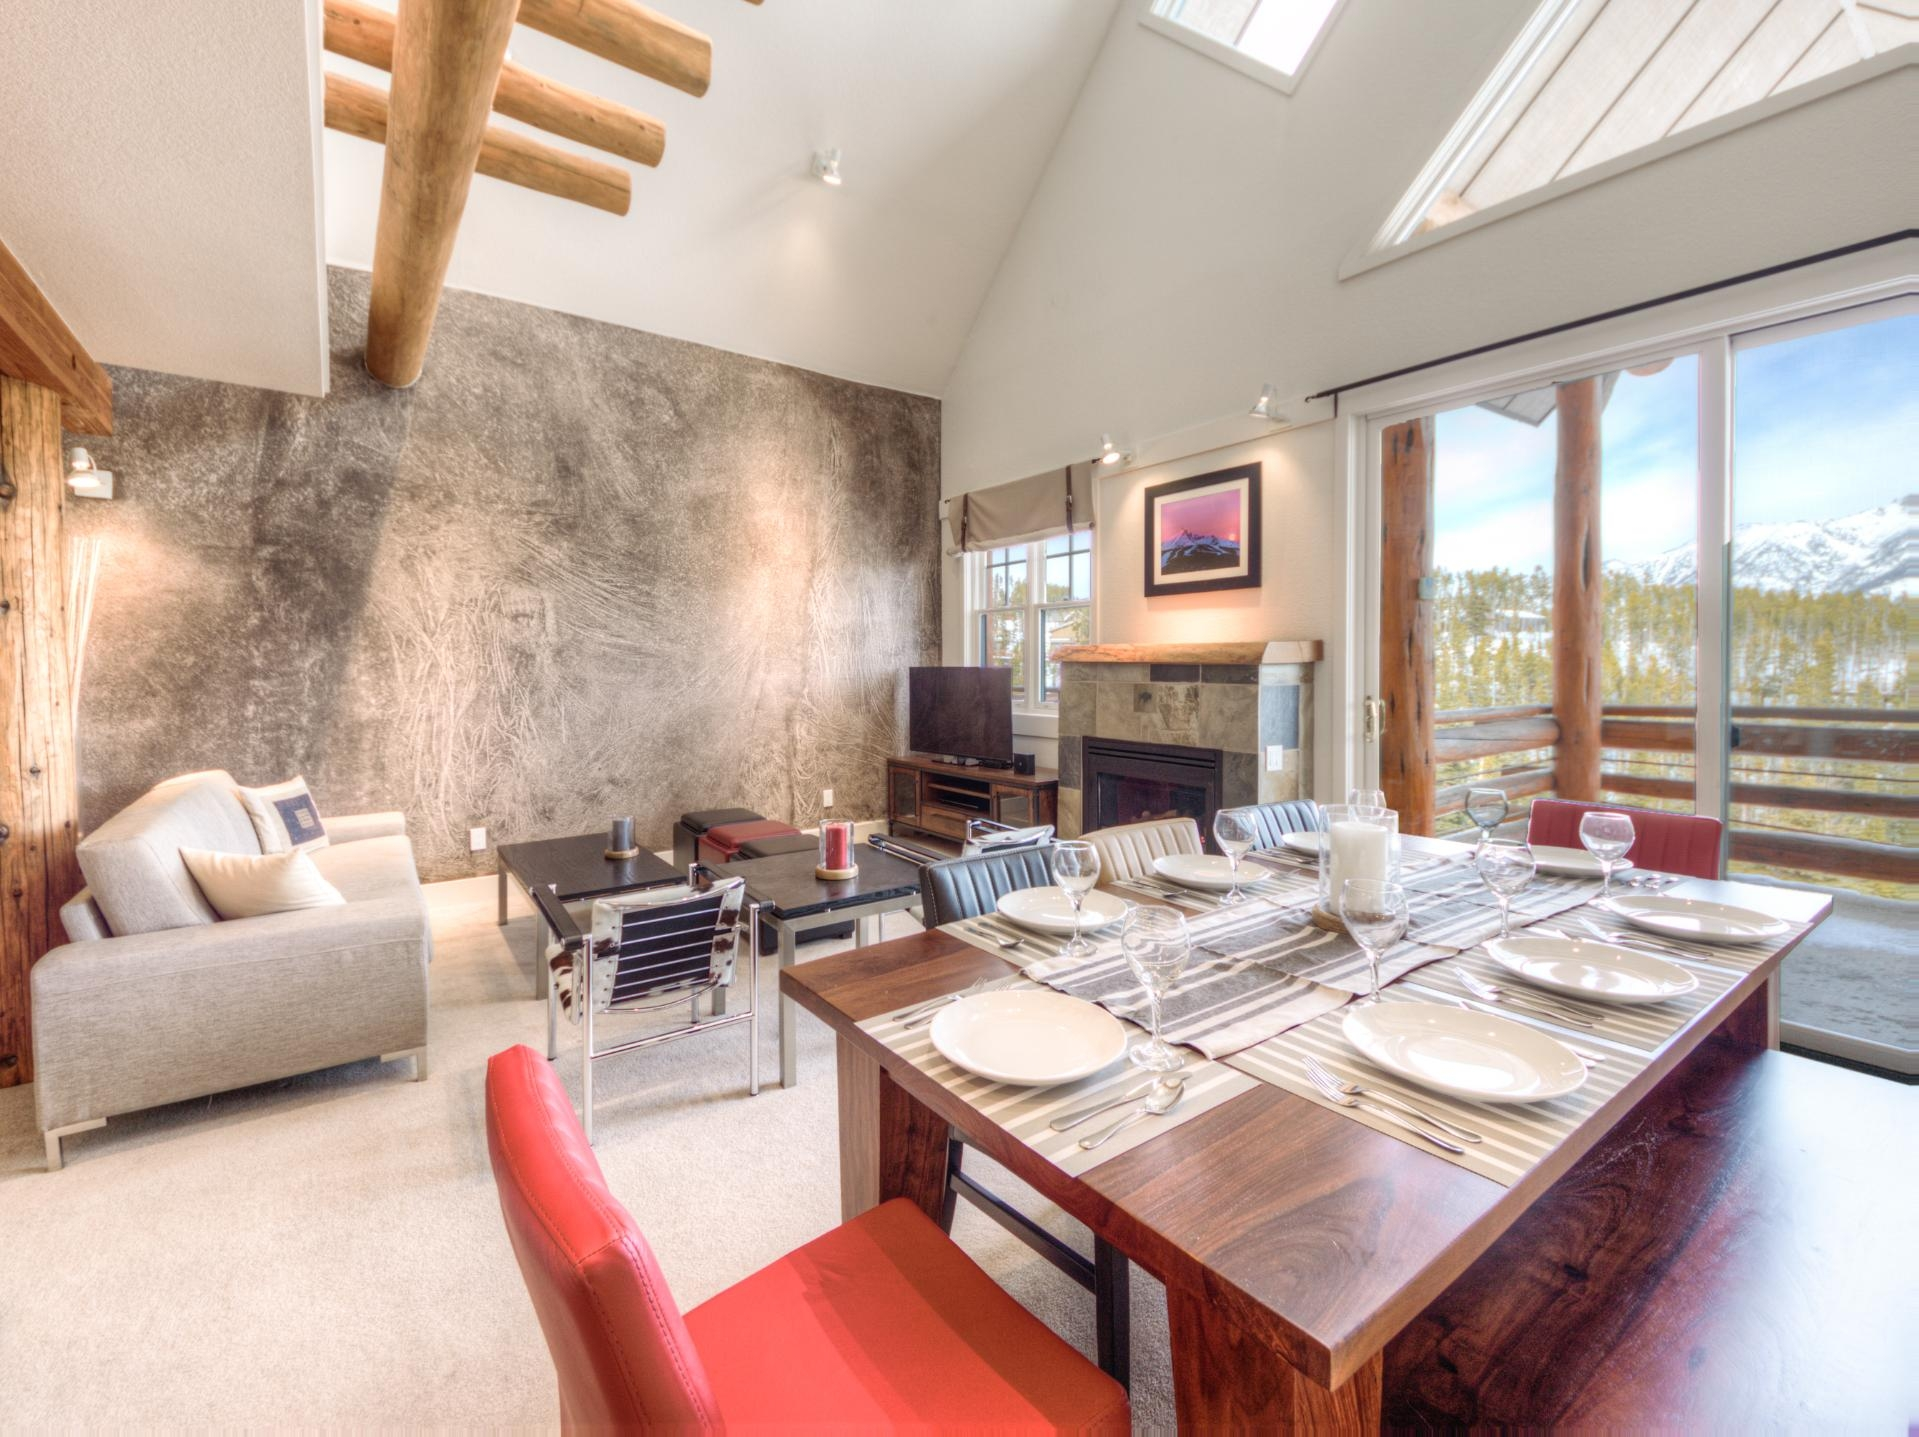 Luxury vacation rentals usa - Montana - Big sky resort - Saddle Ridge Townhome | Unit D3 - Image 1/33